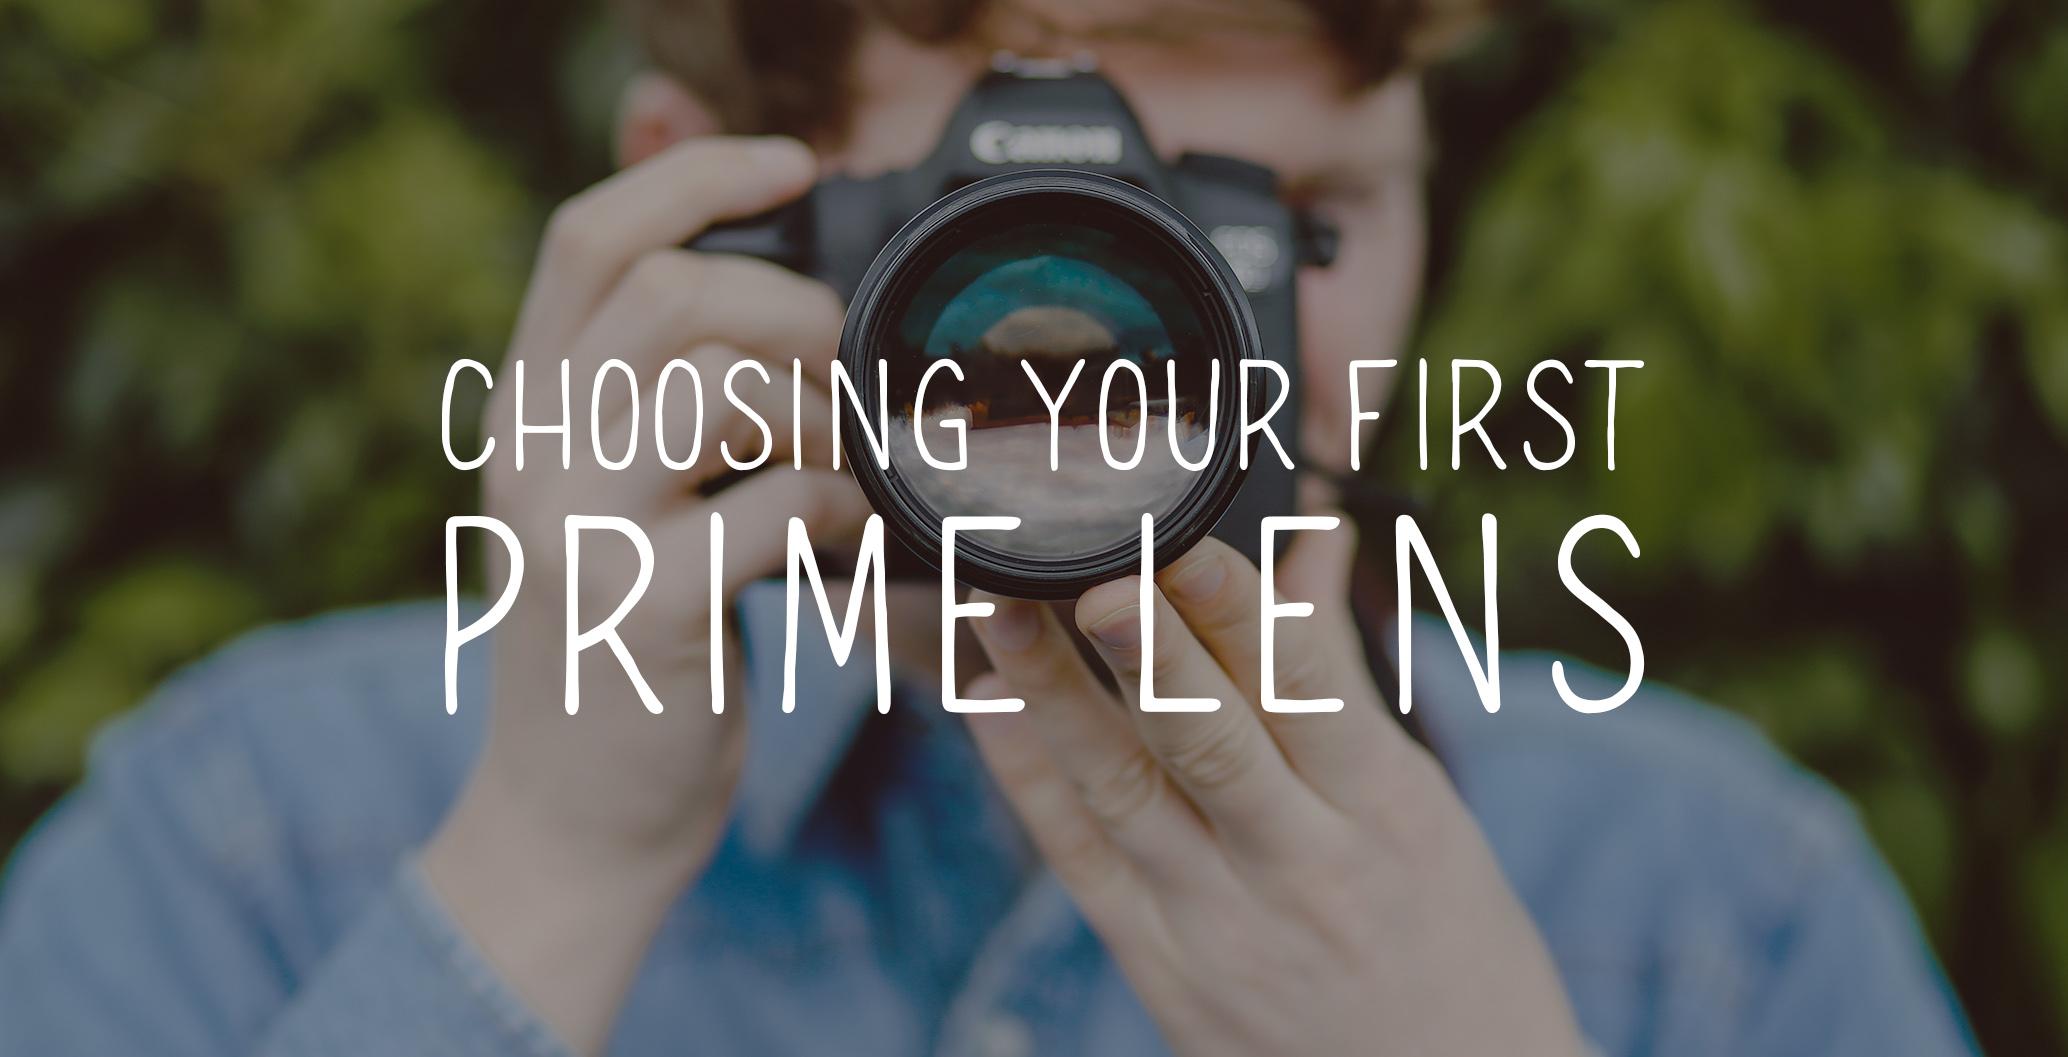 choosing your first prime lens.jpg